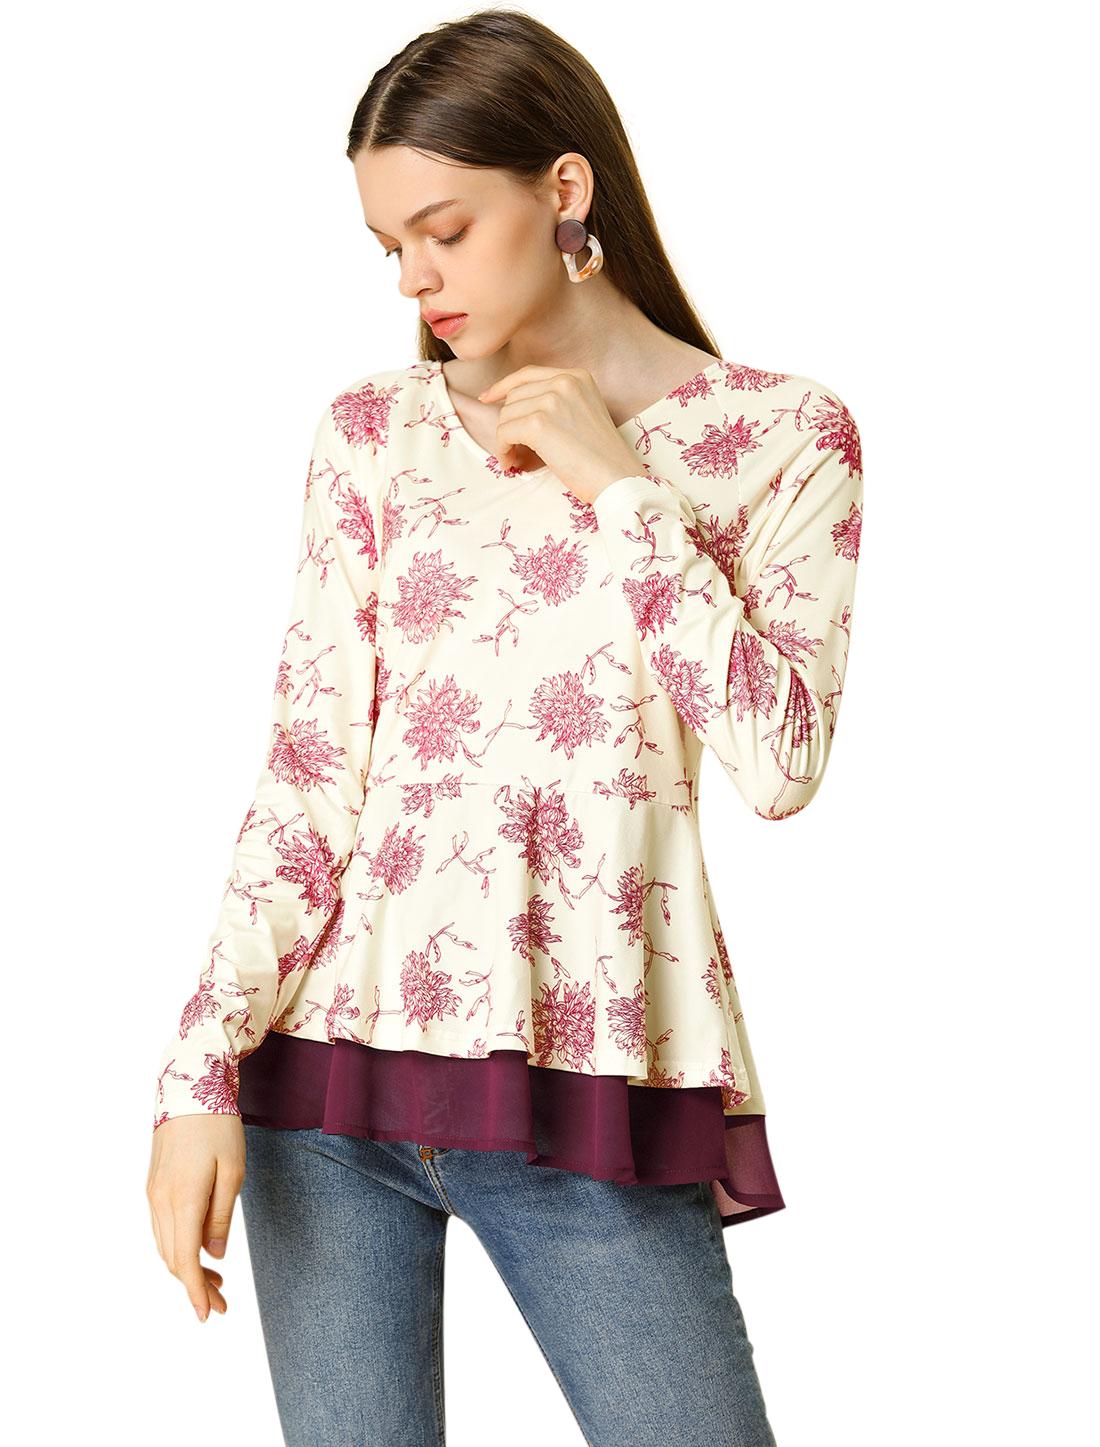 Allegra K Women's Floral V Neck Raglan Sleeve Ruffles Hem Loose Top Beige XL